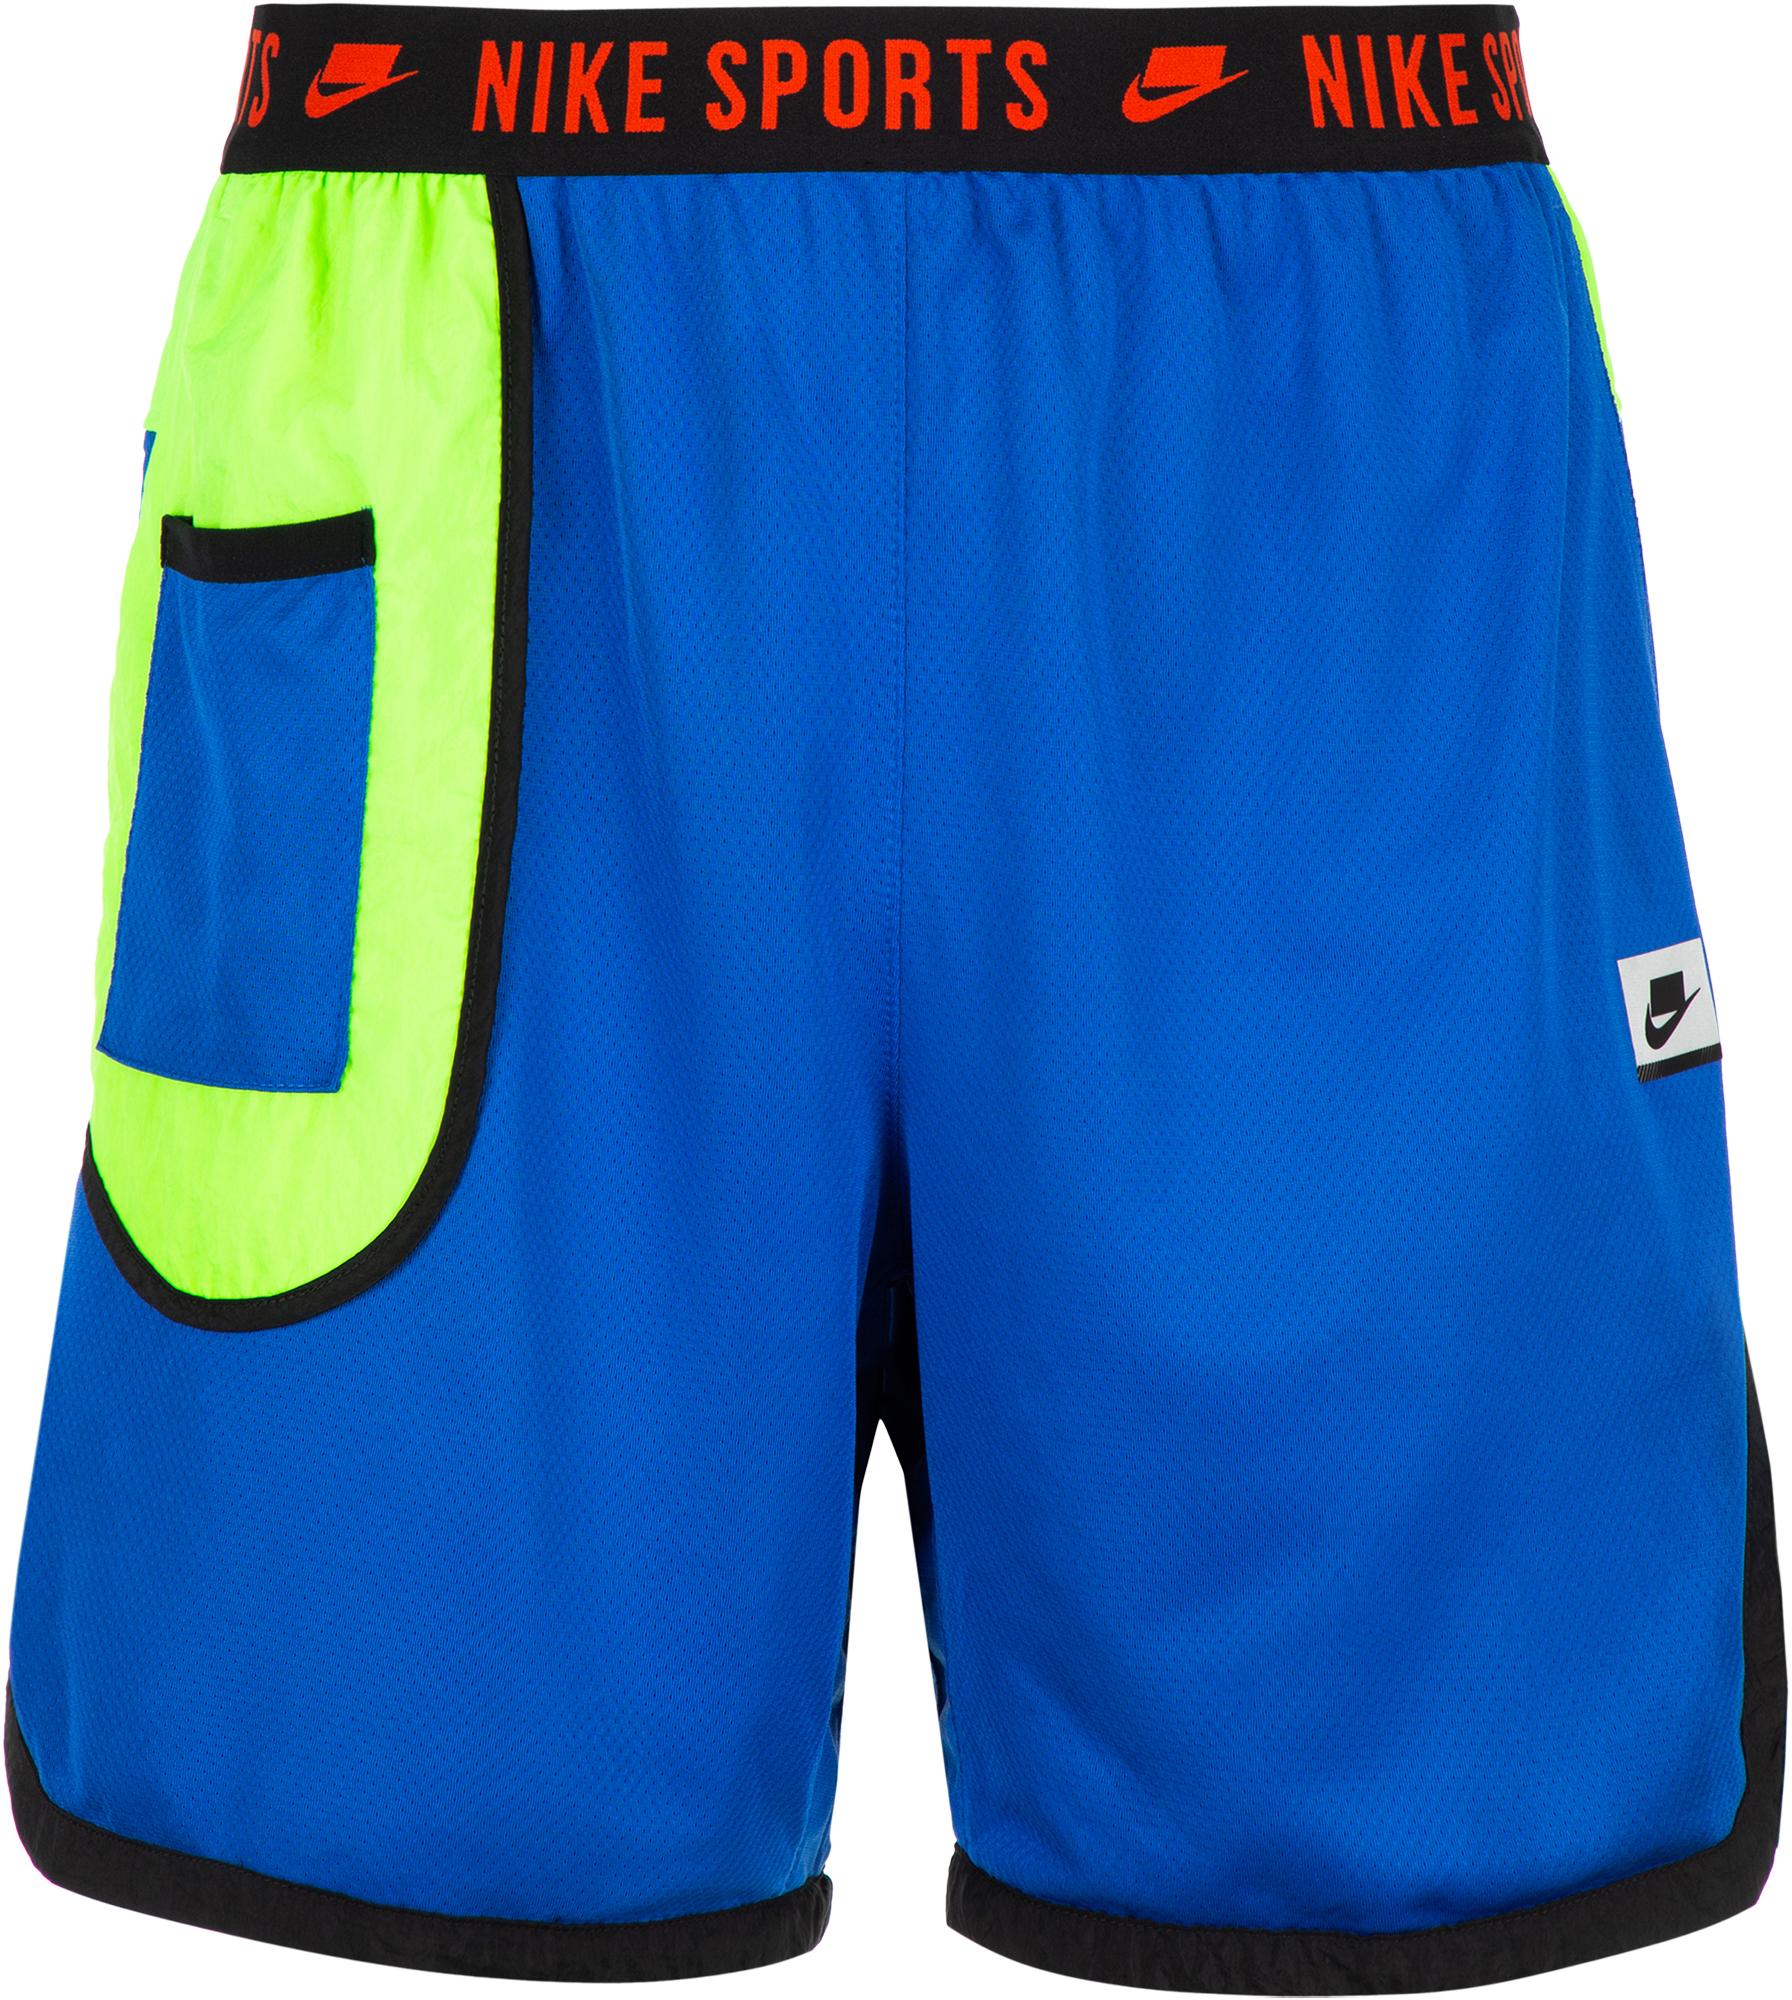 Nike Шорты мужские Dry, размер 50-52